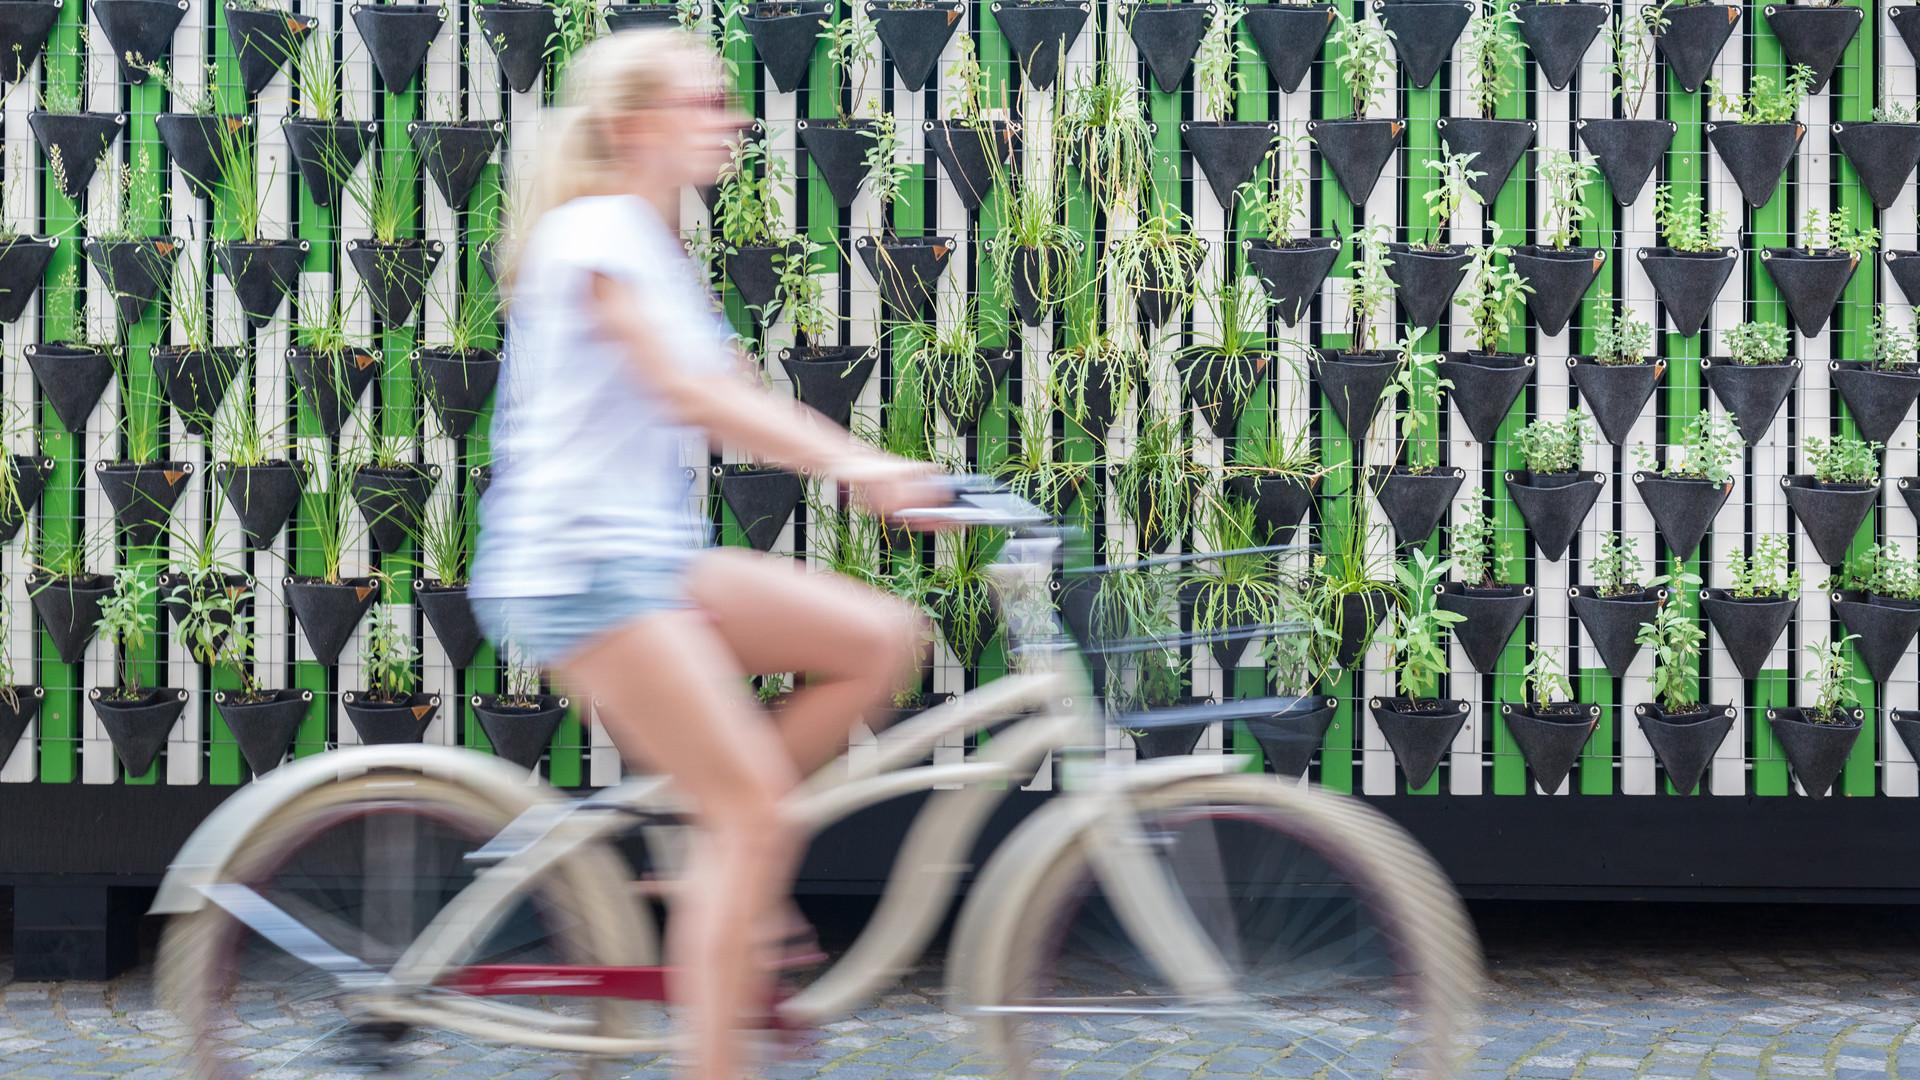 Plants, Bicycle, Woman,